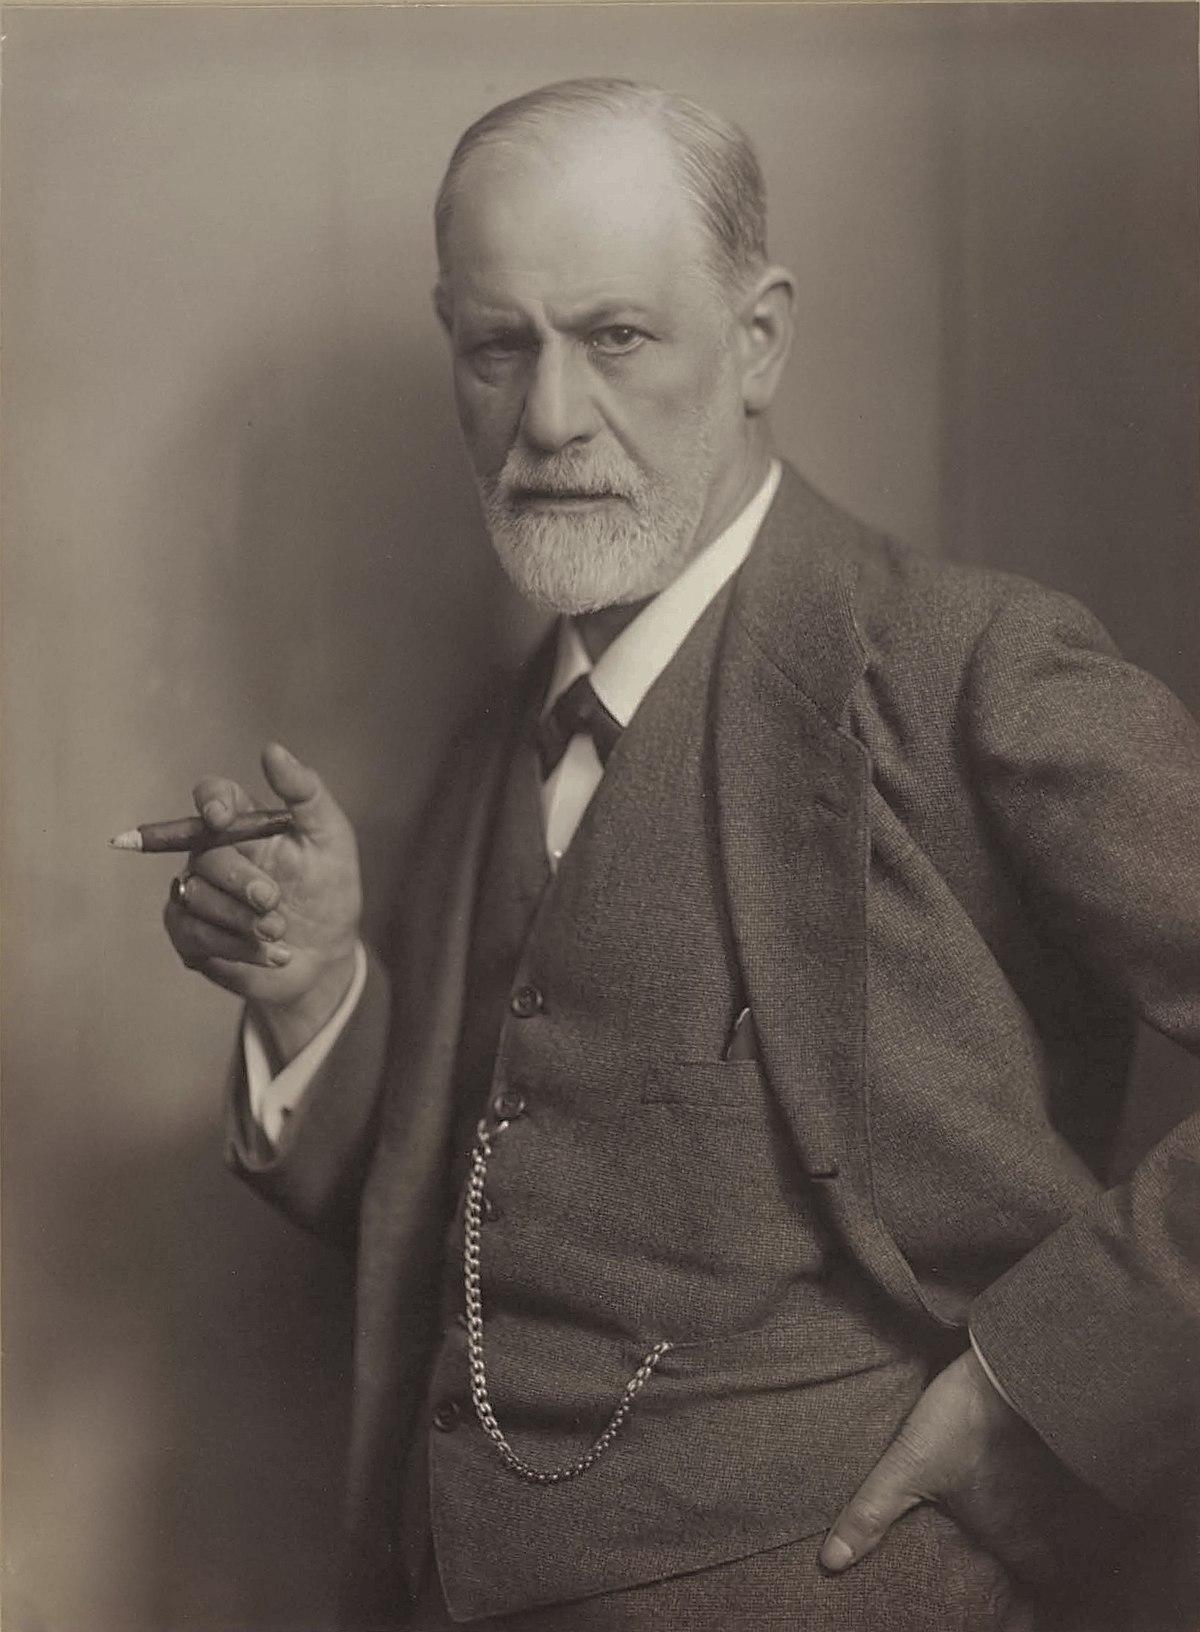 1200px-Sigmund_Freud,_by_Max_Halberstadt_(cropped).jpg